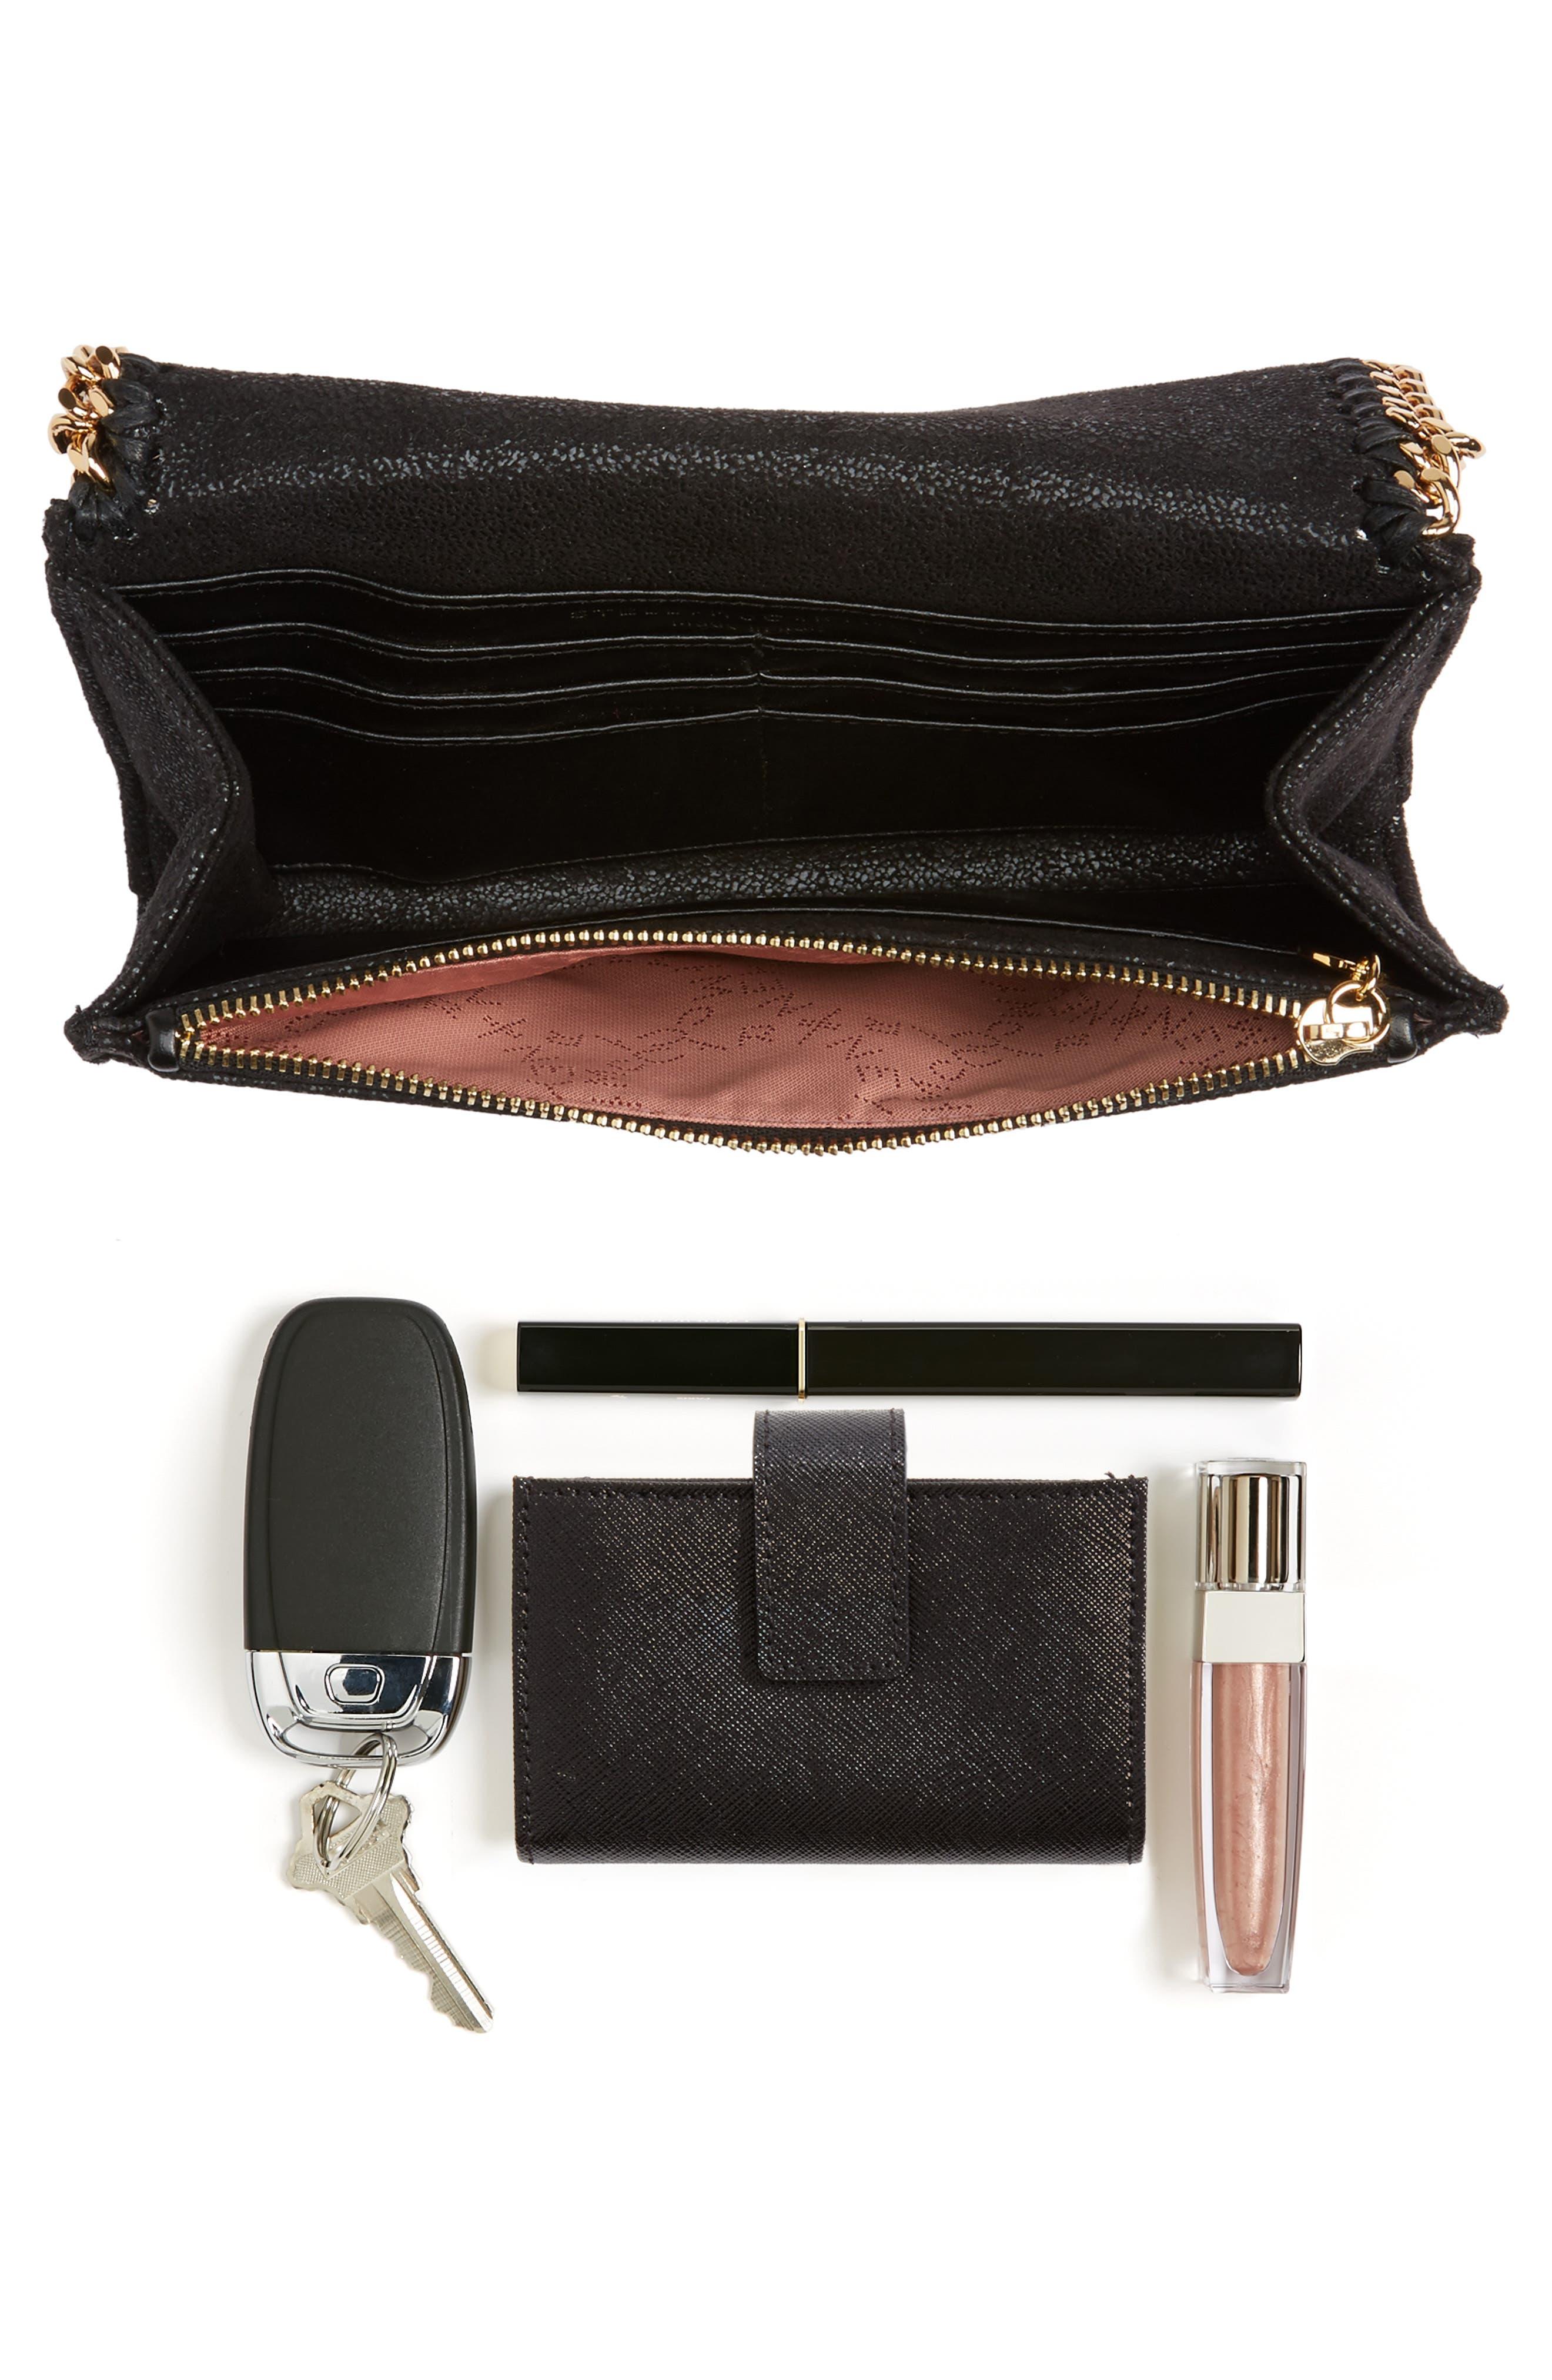 STELLA MCCARTNEY,                             Shaggy Deer Faux Leather Crossbody Bag,                             Alternate thumbnail 7, color,                             BLACK